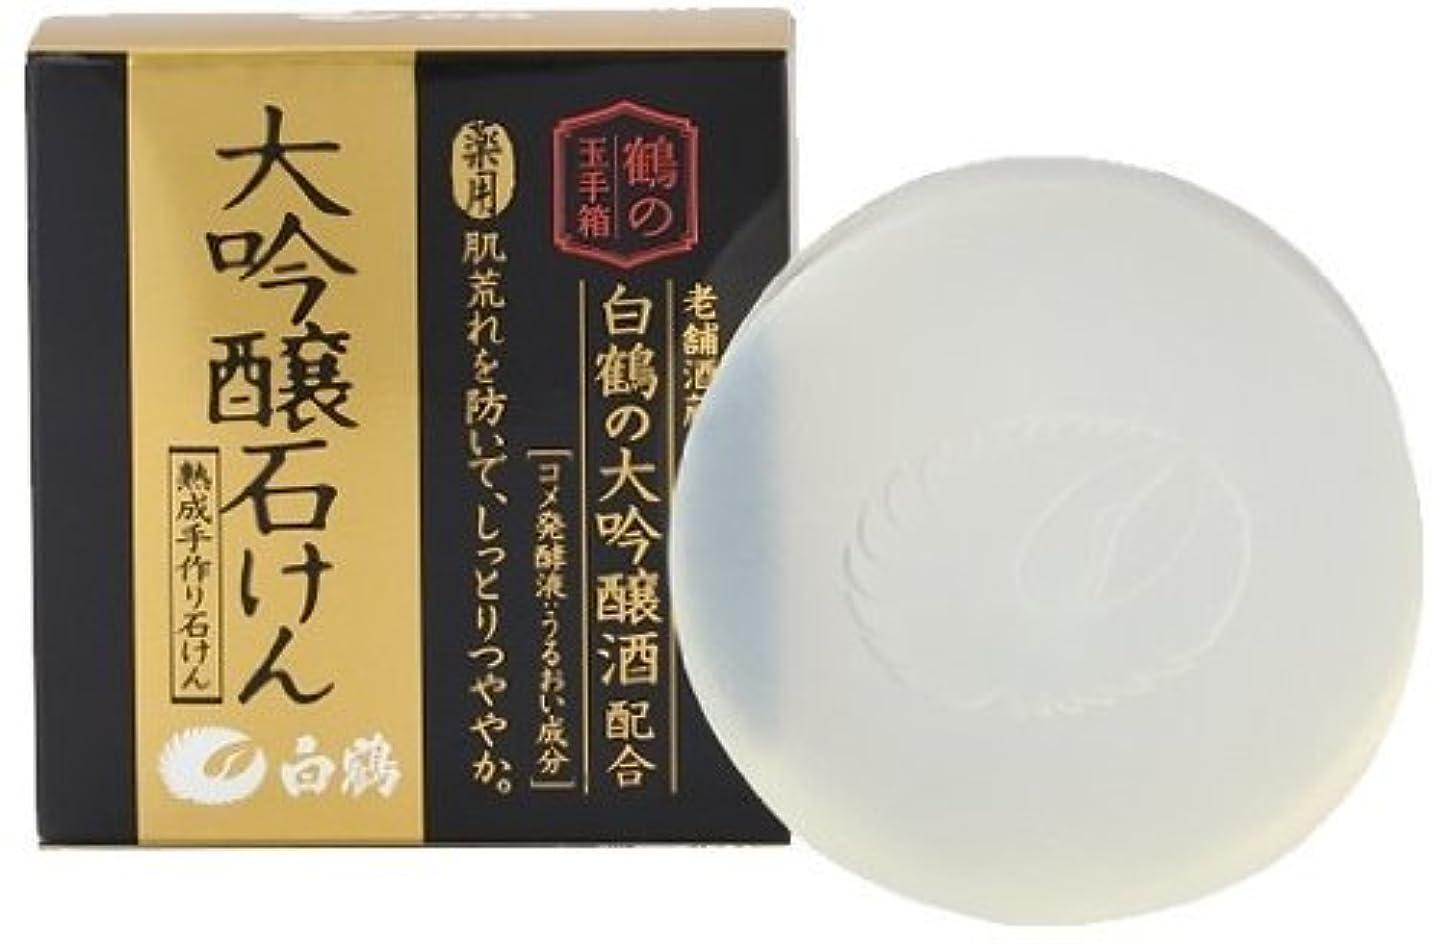 老人迅速間接的白鶴 鶴の玉手箱 大吟醸石けん 100g × 10個 (薬用)(医薬部外品)